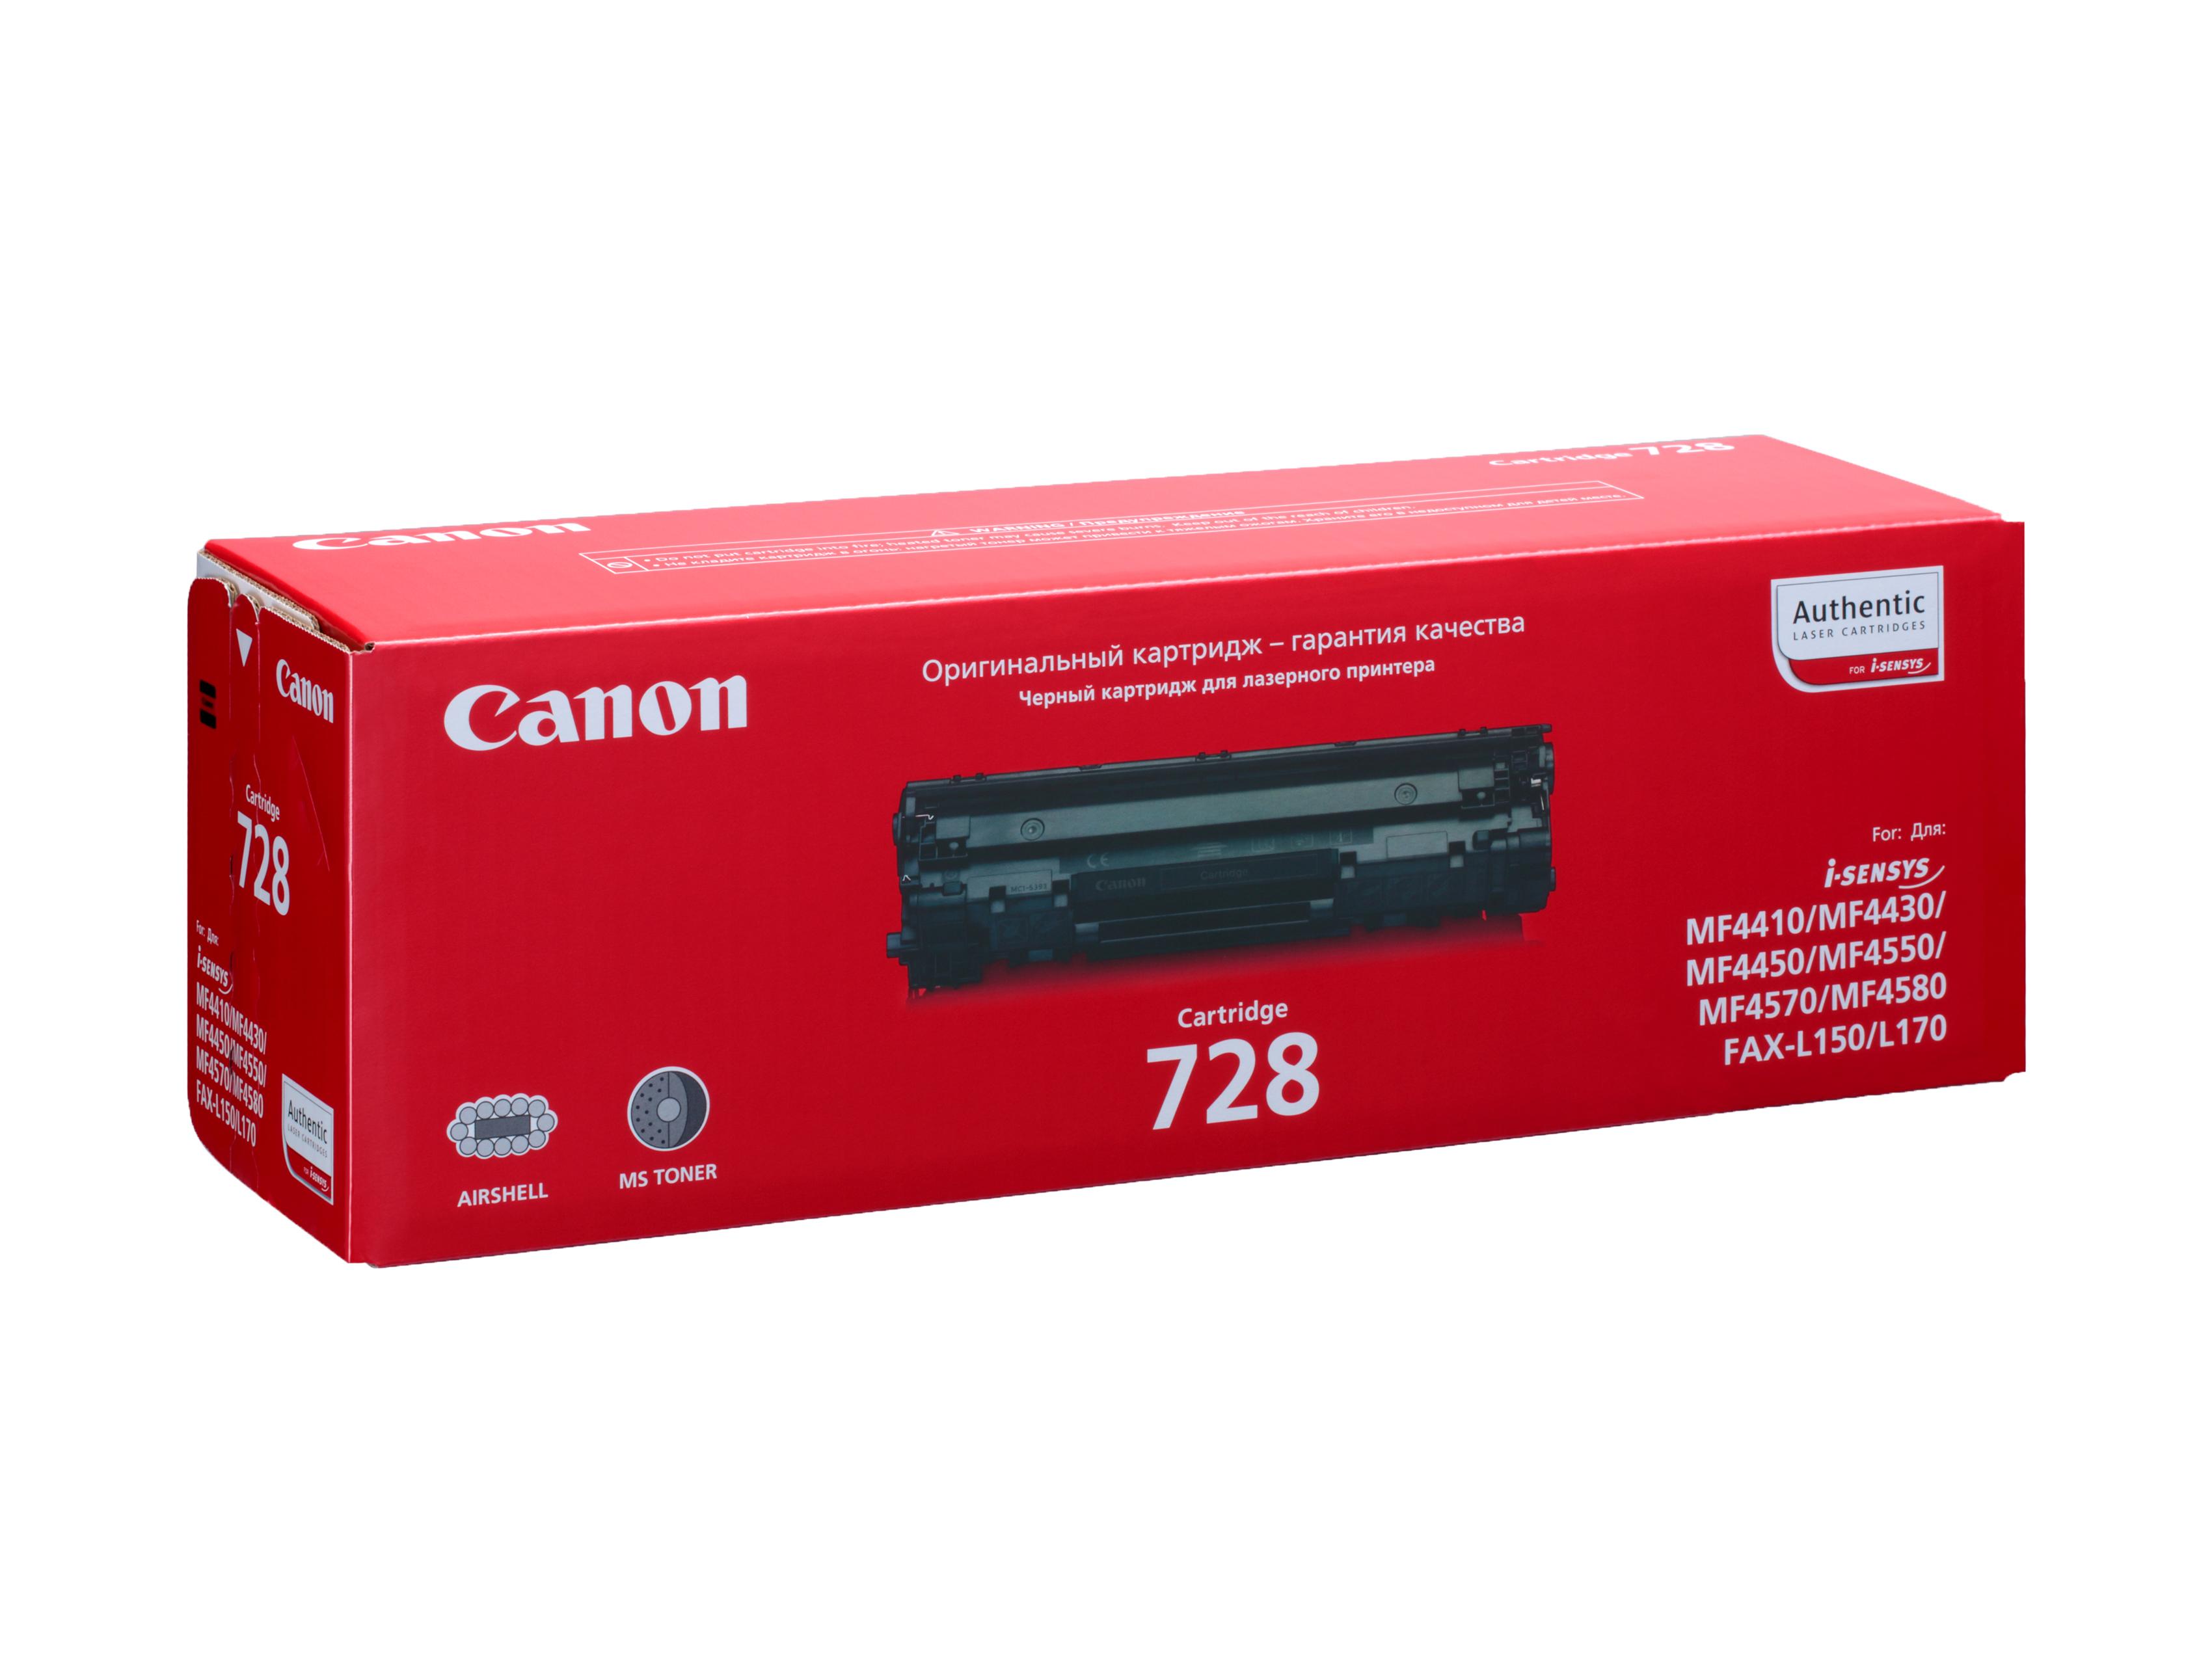 Картридж Canon 728 для i-SENSYS MF4410/MF4430/MF4450 /MF4550D/MF4570DN/MF 4580DN. Чёрный. 2100 страниц. тонер картридж cactus csp c728 premium черный для canon i sensys mf4410 4430 4450 4550d 3000стр